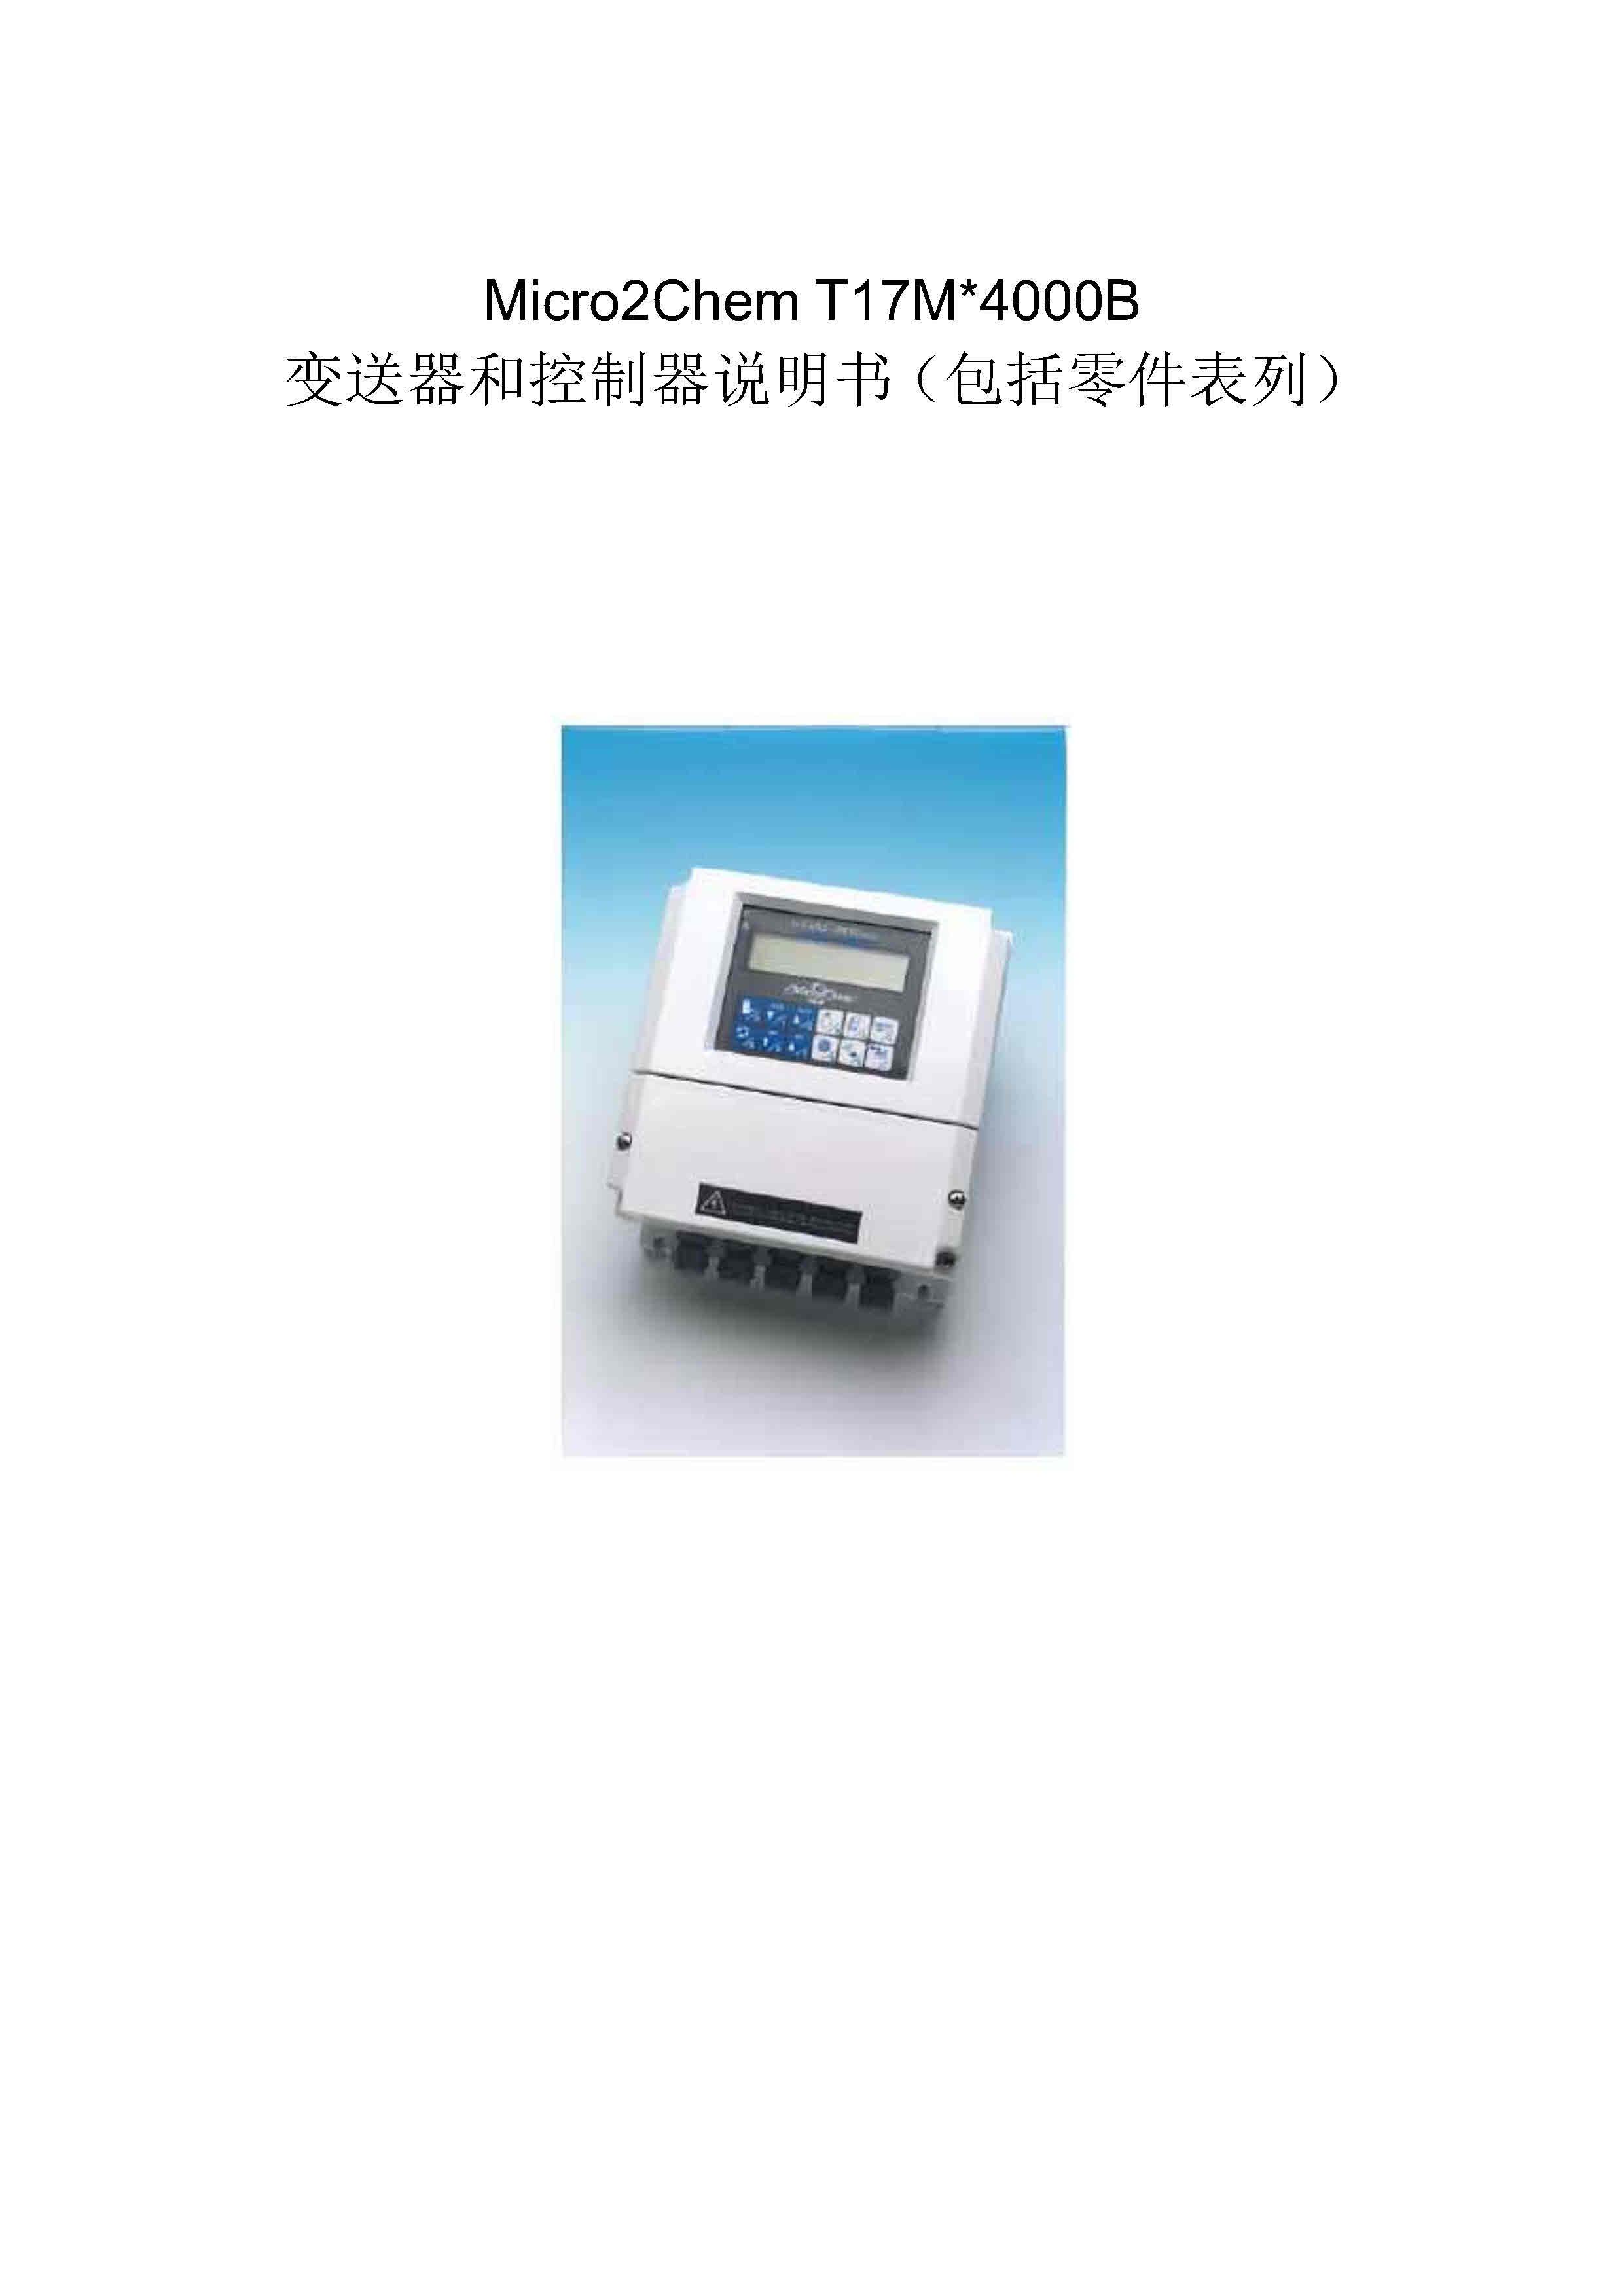 MICRO2CHEM T17M 4000B 余氯说明书